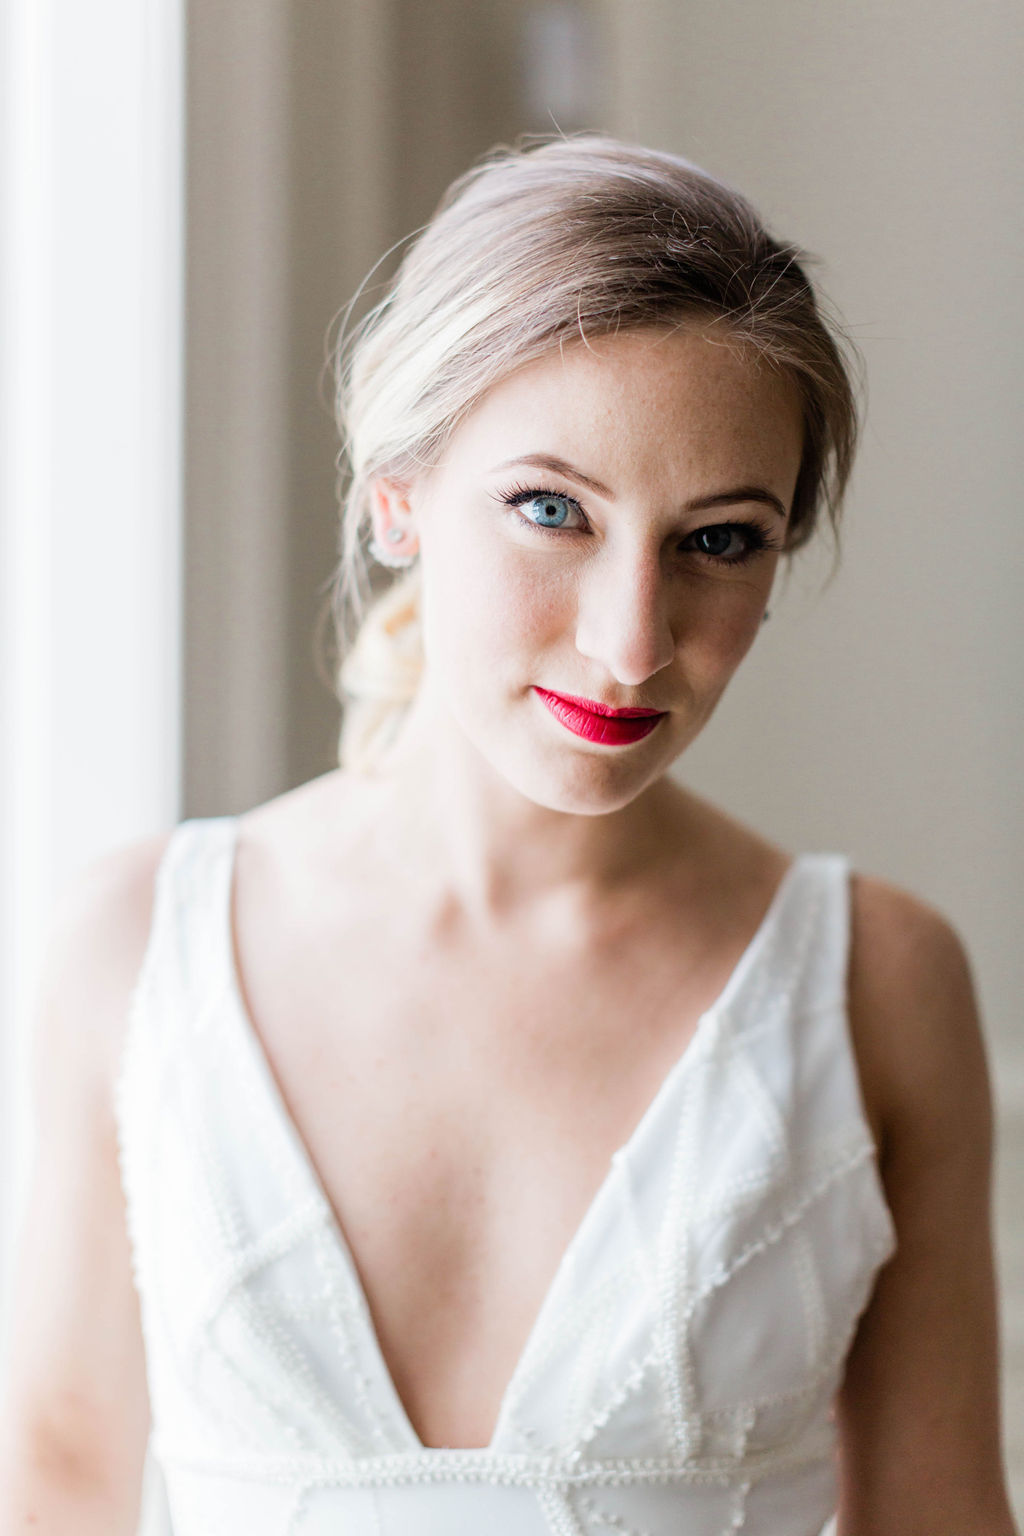 Red Lip Wedding Makeup | Varca Bridal | Chicago History Museum | Black and White Wedding | Black Tie Wedding | Your Day by MK | Chicago Wedding Planner |